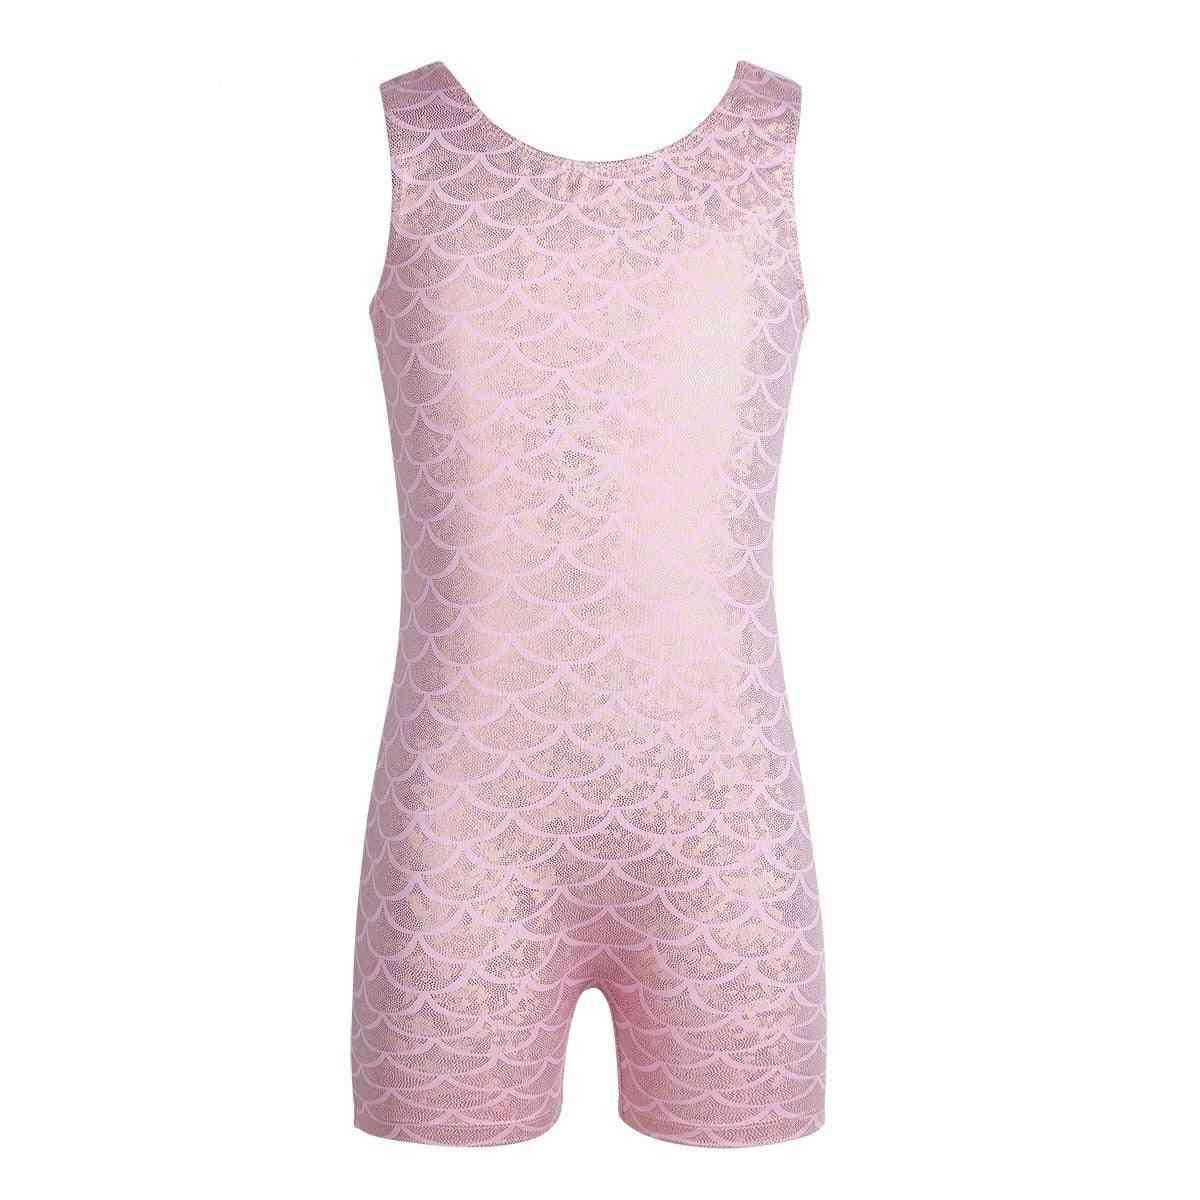 Swimwear Sleeveless Glittery Scales Printed Jumpsuit Dance Wear